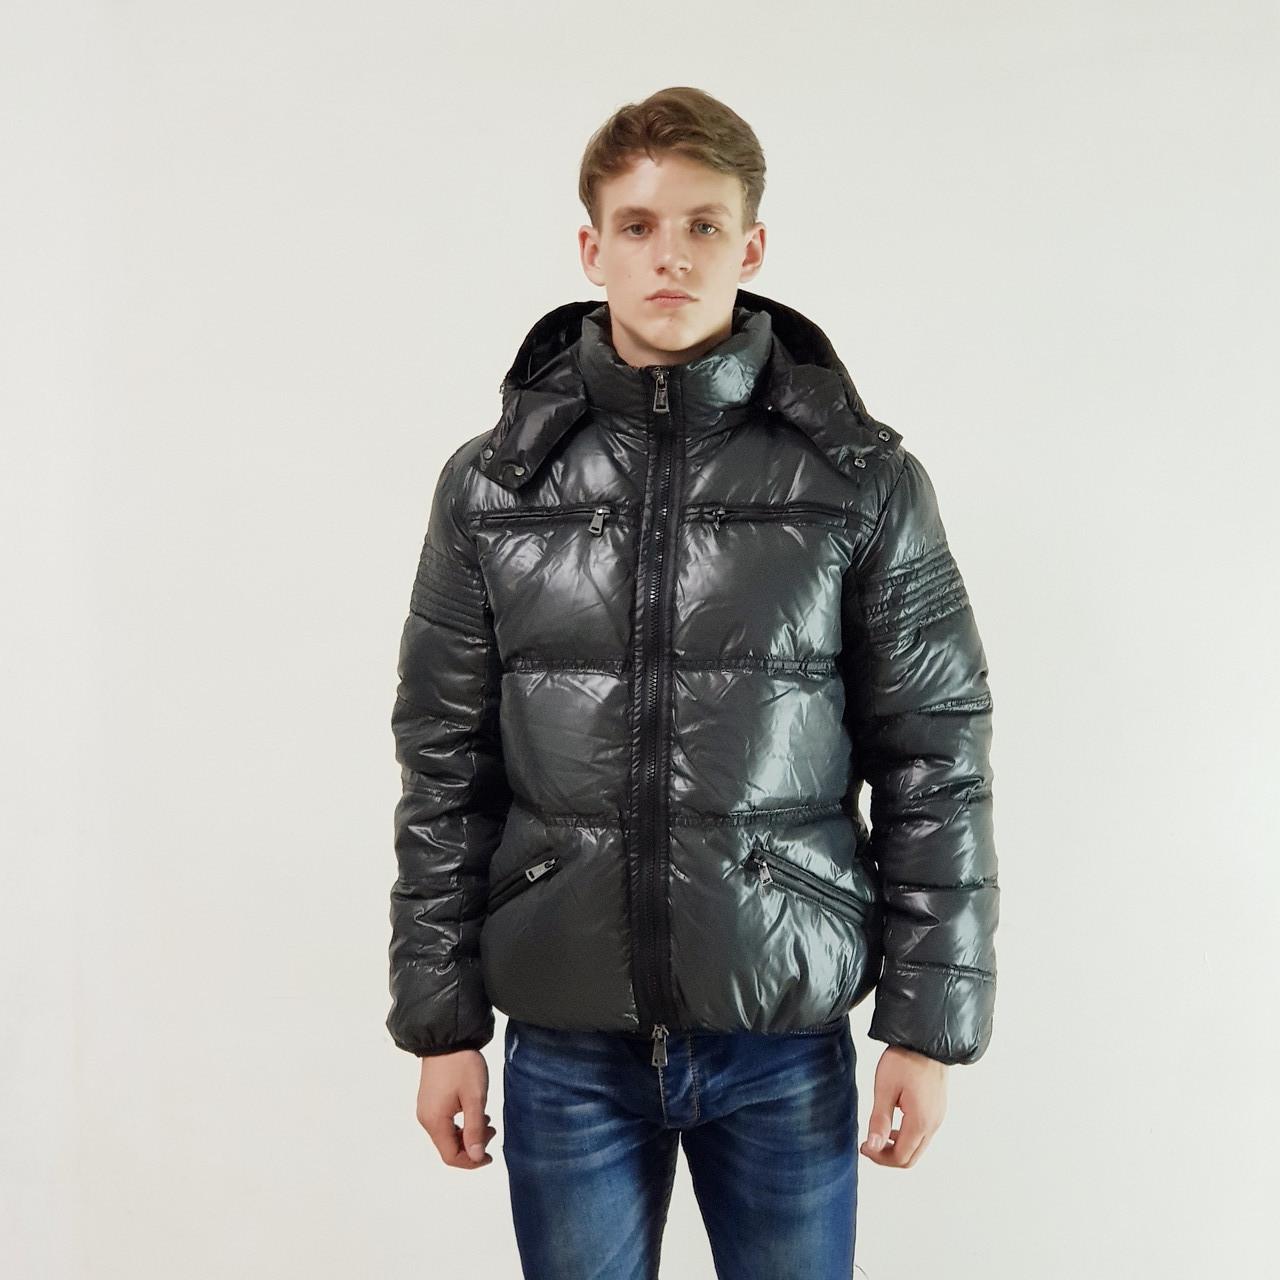 Куртка мужская зимняя Snowimage с капюшоном 46 темно-серый 133-9077